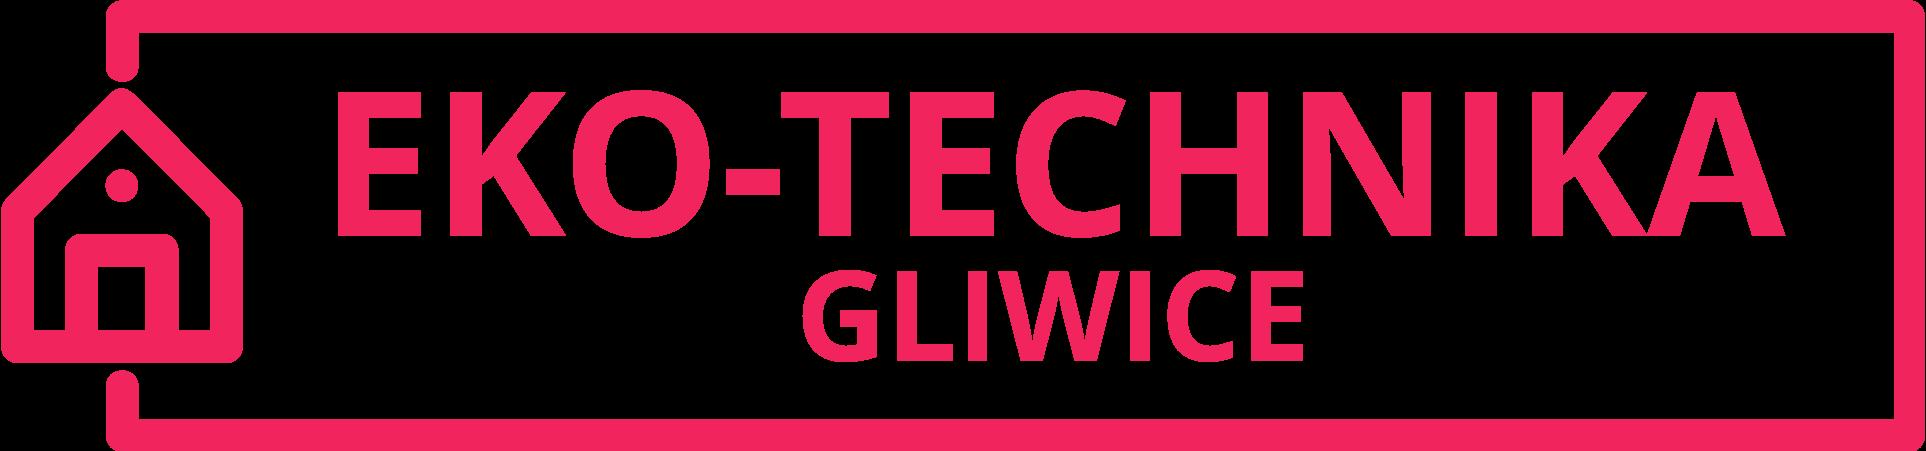 Eko-Technika Gliwice